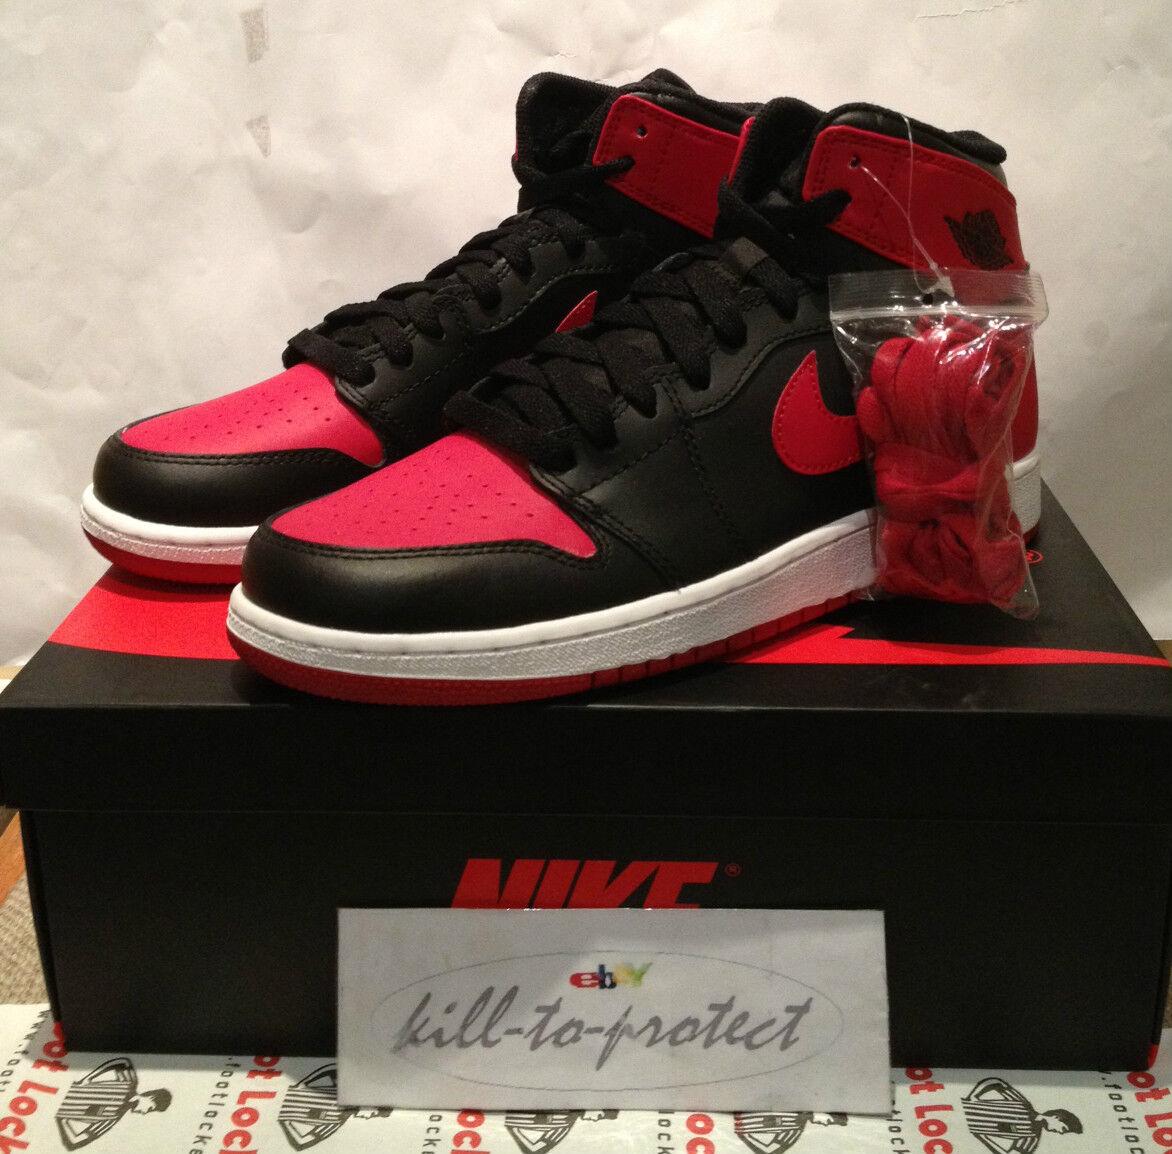 NIKE Air Jordan 1 allevati GS Kids SZ UK osta 4 5 6 7Y Nero Rosso 575441-023 vietato